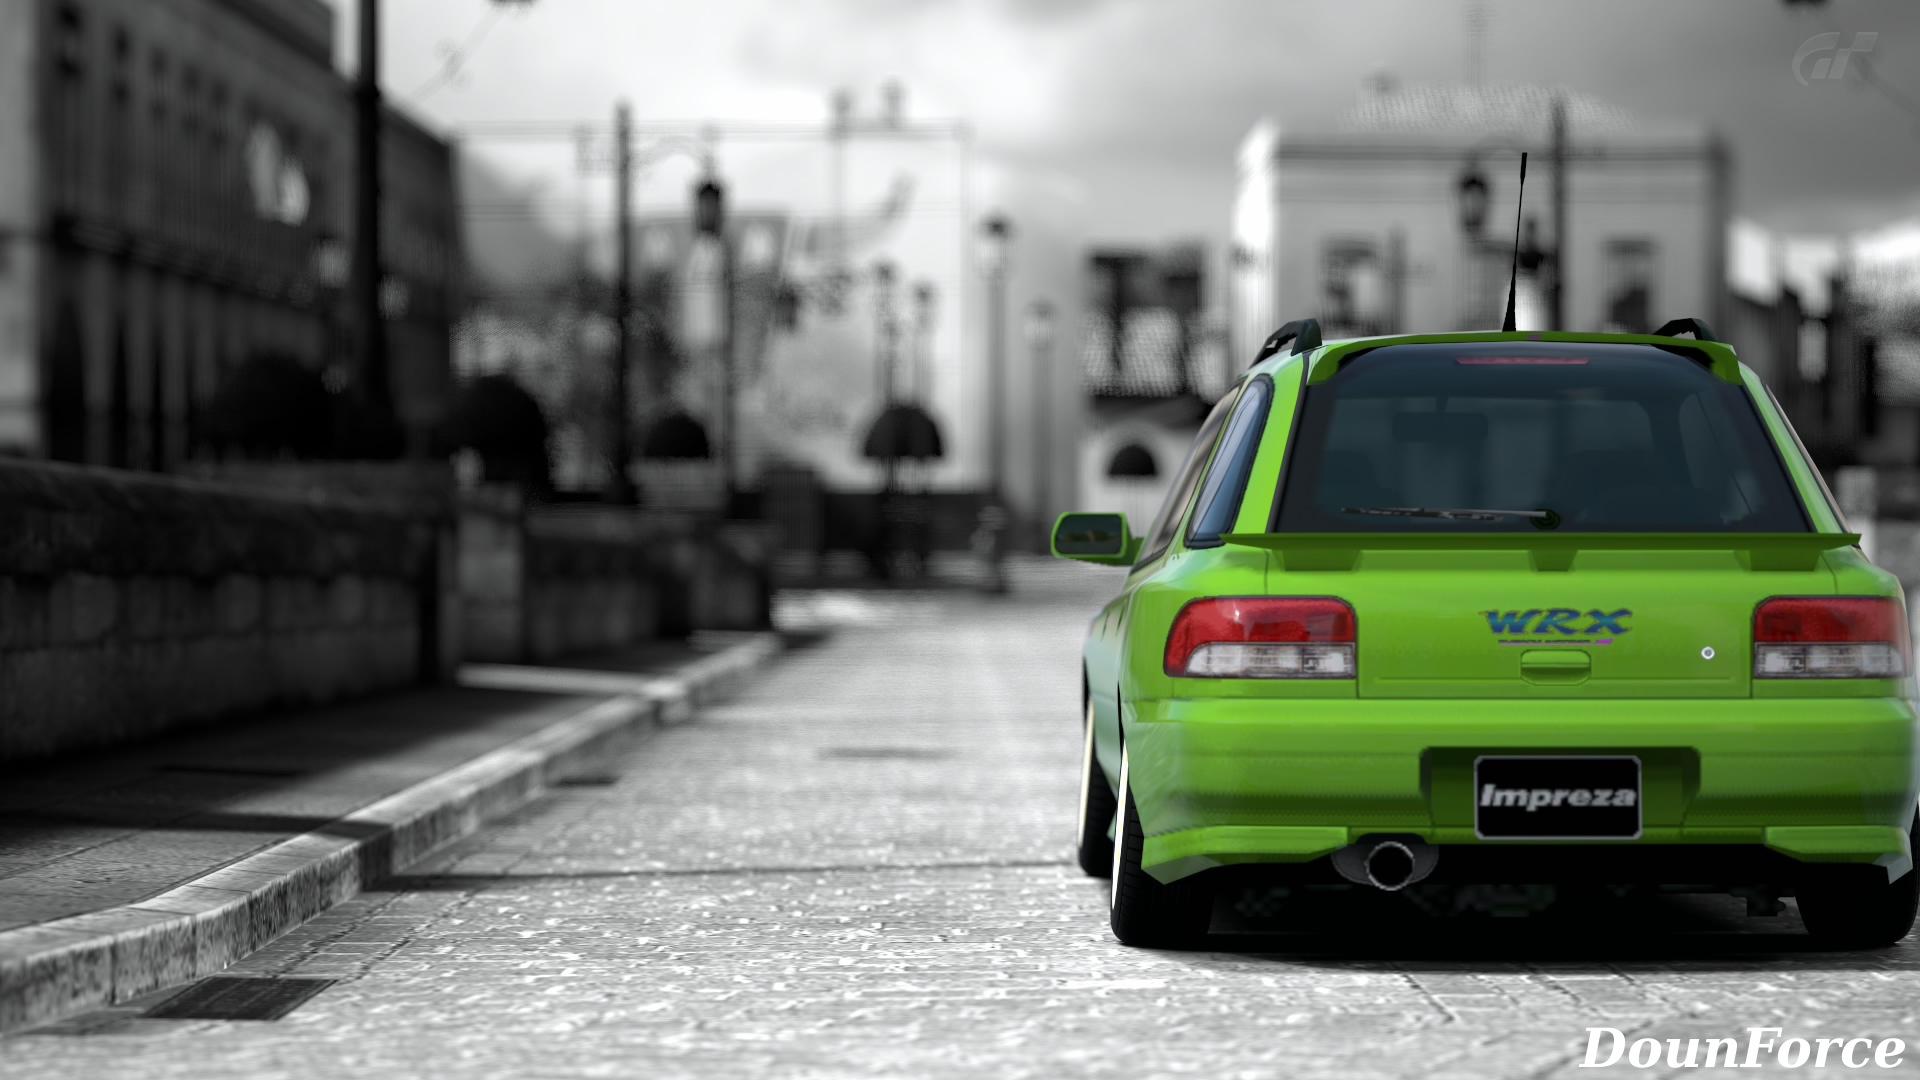 Impreza Sportwagon Wrx Sti Version Gran Turismo 6壁紙 Downforce